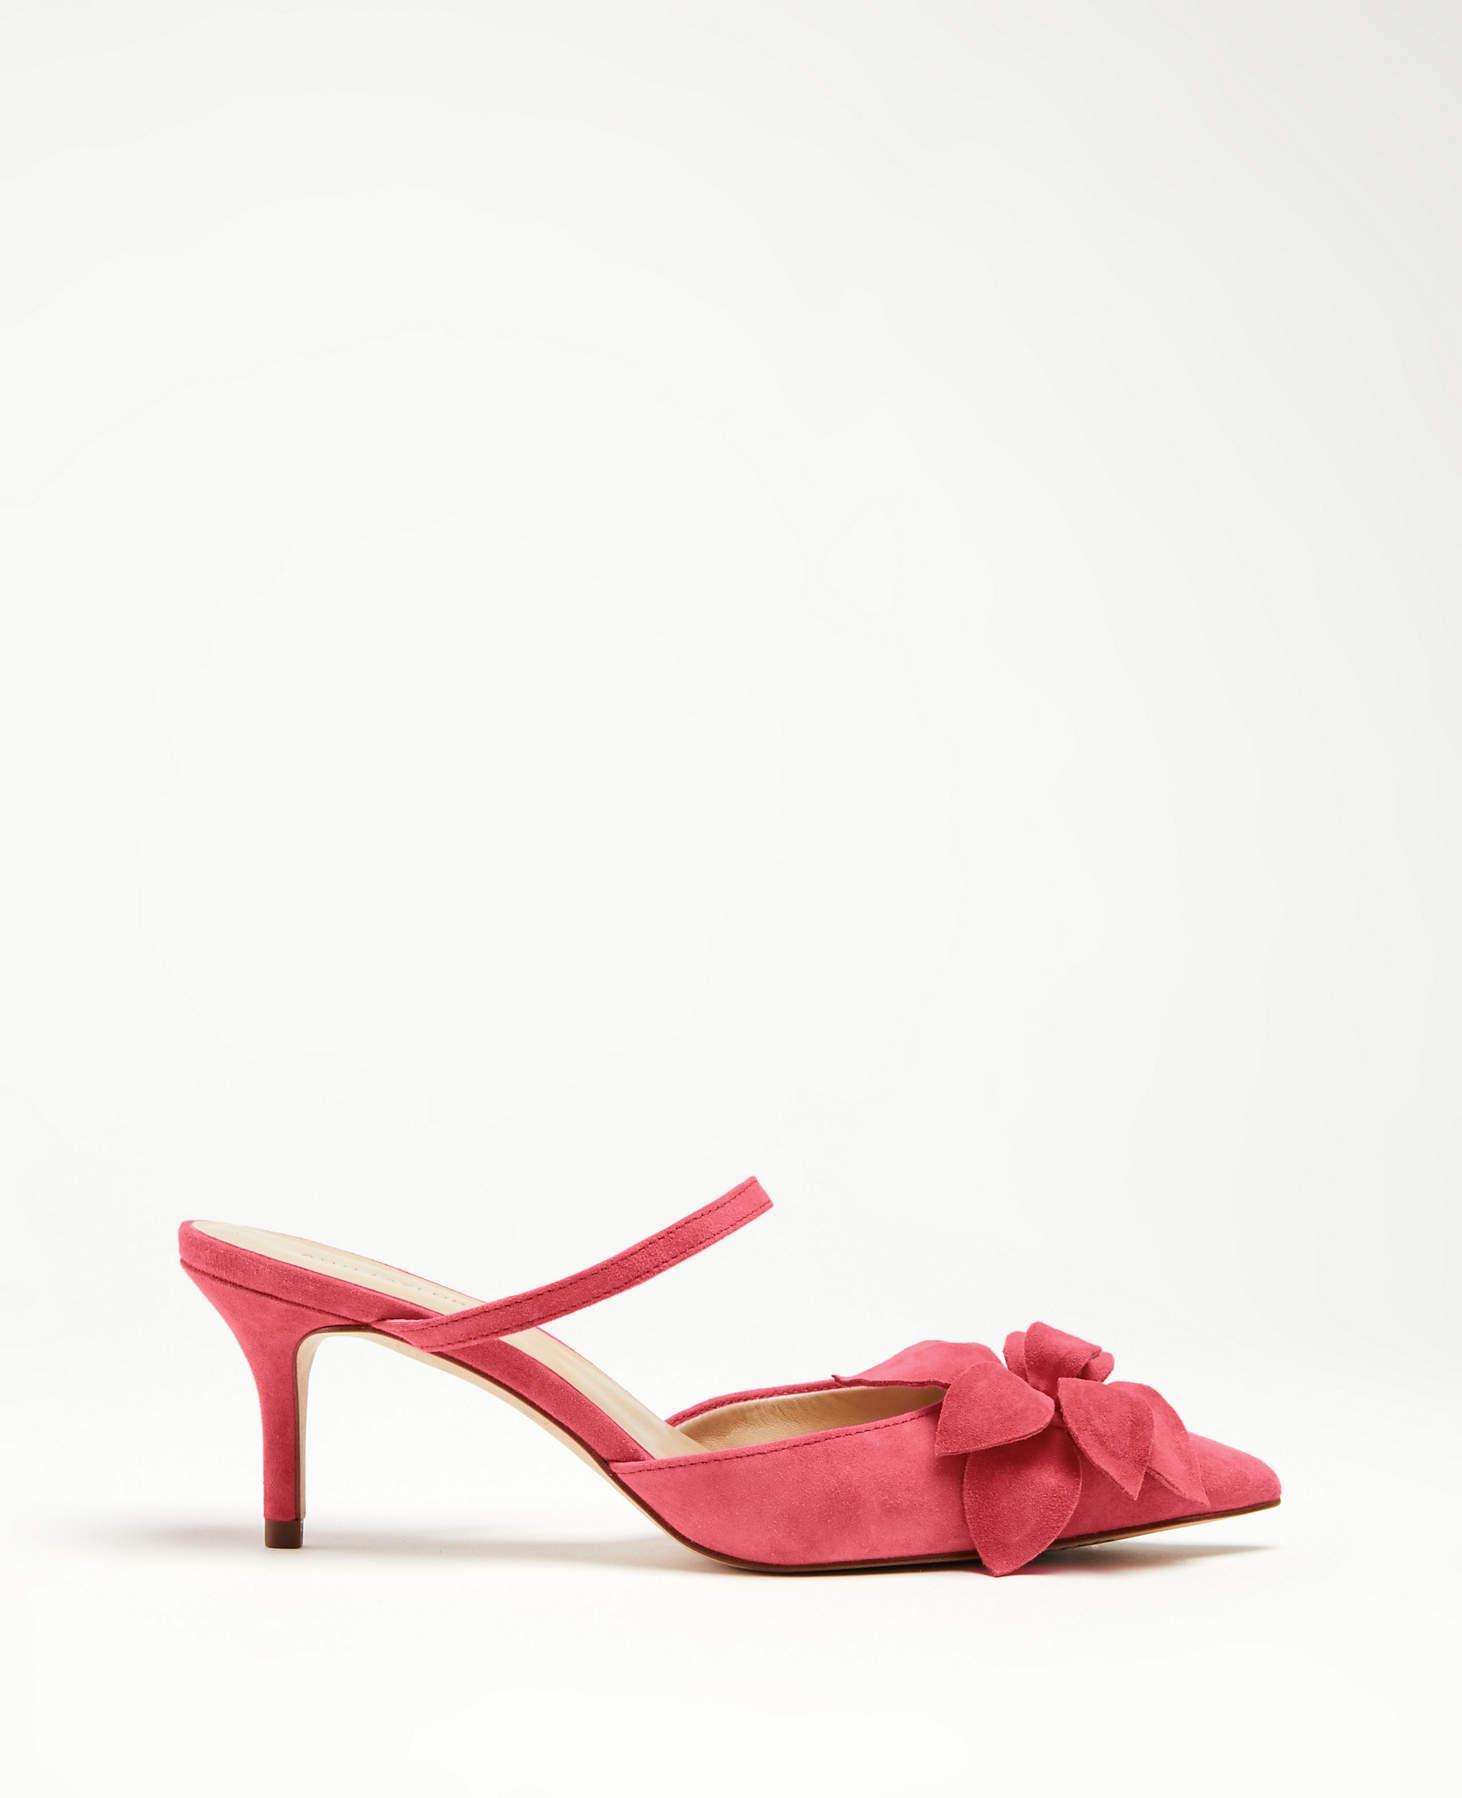 99748b1f4508 Lyst - Ann Taylor Celina Flower Suede Pumps in Pink